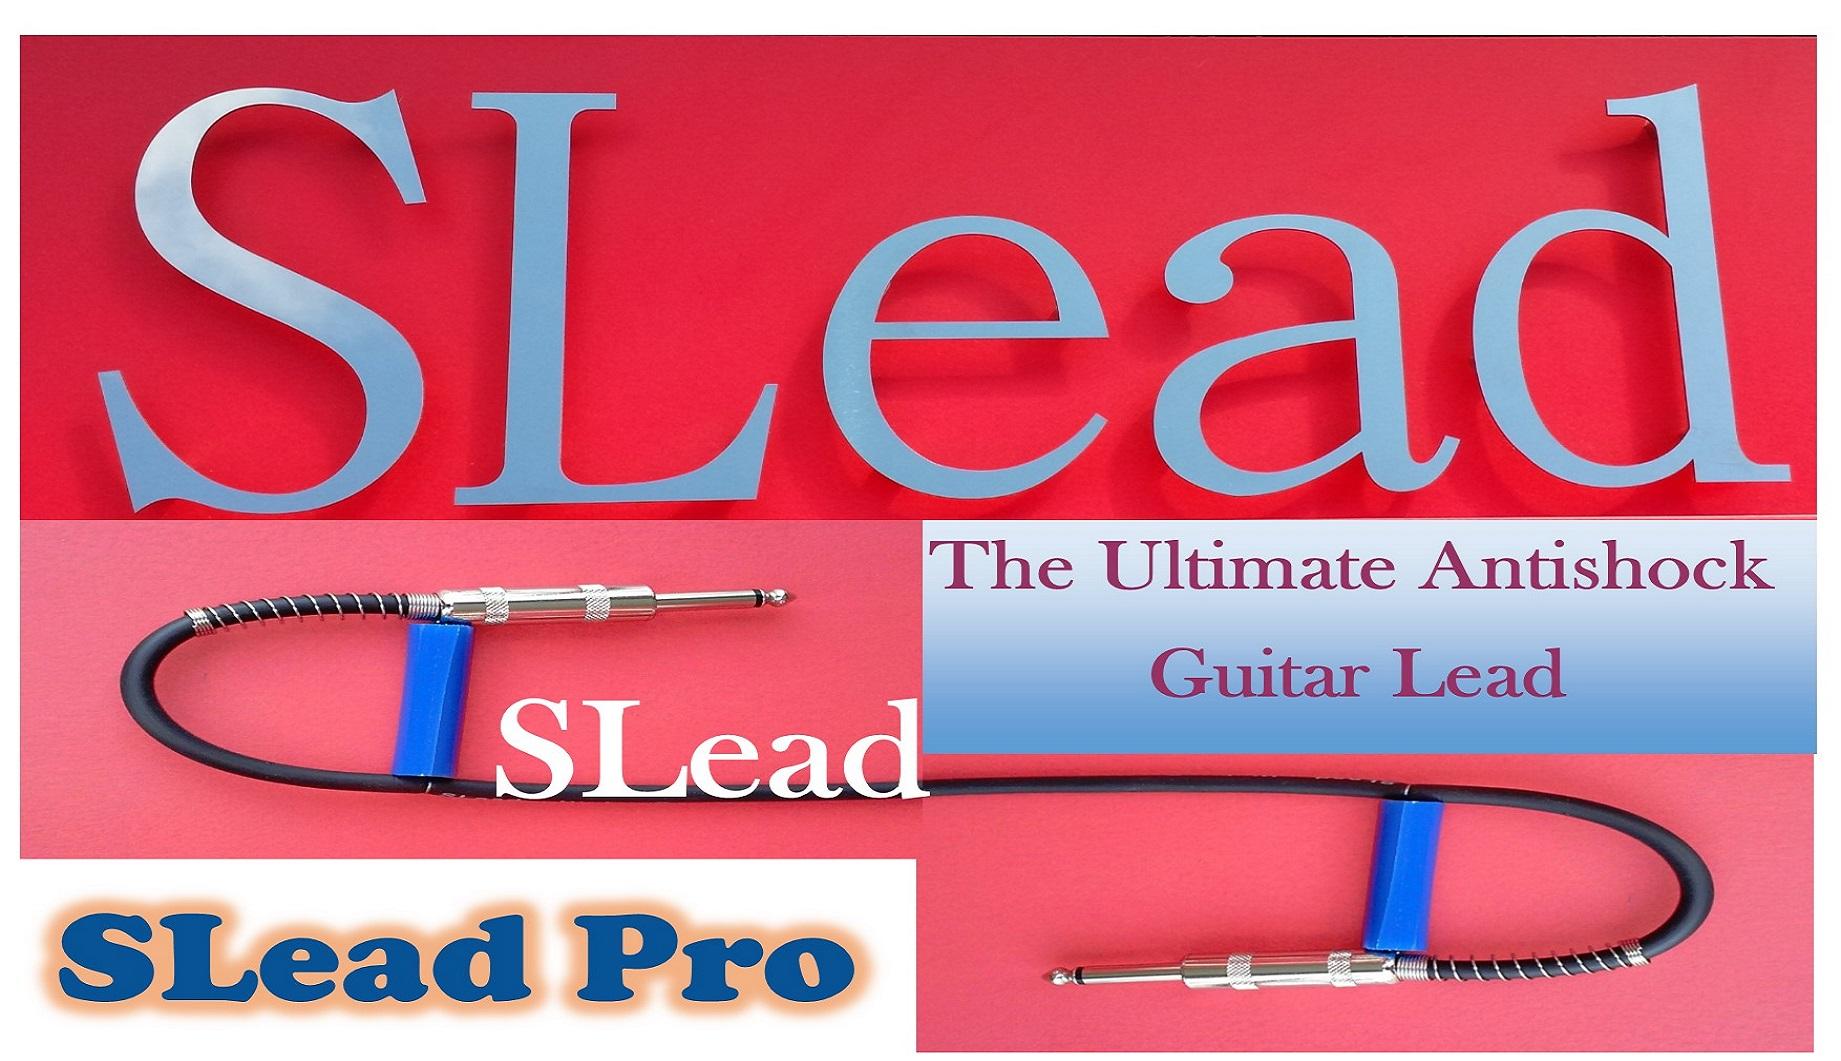 SLead Pro international shipping £4.90